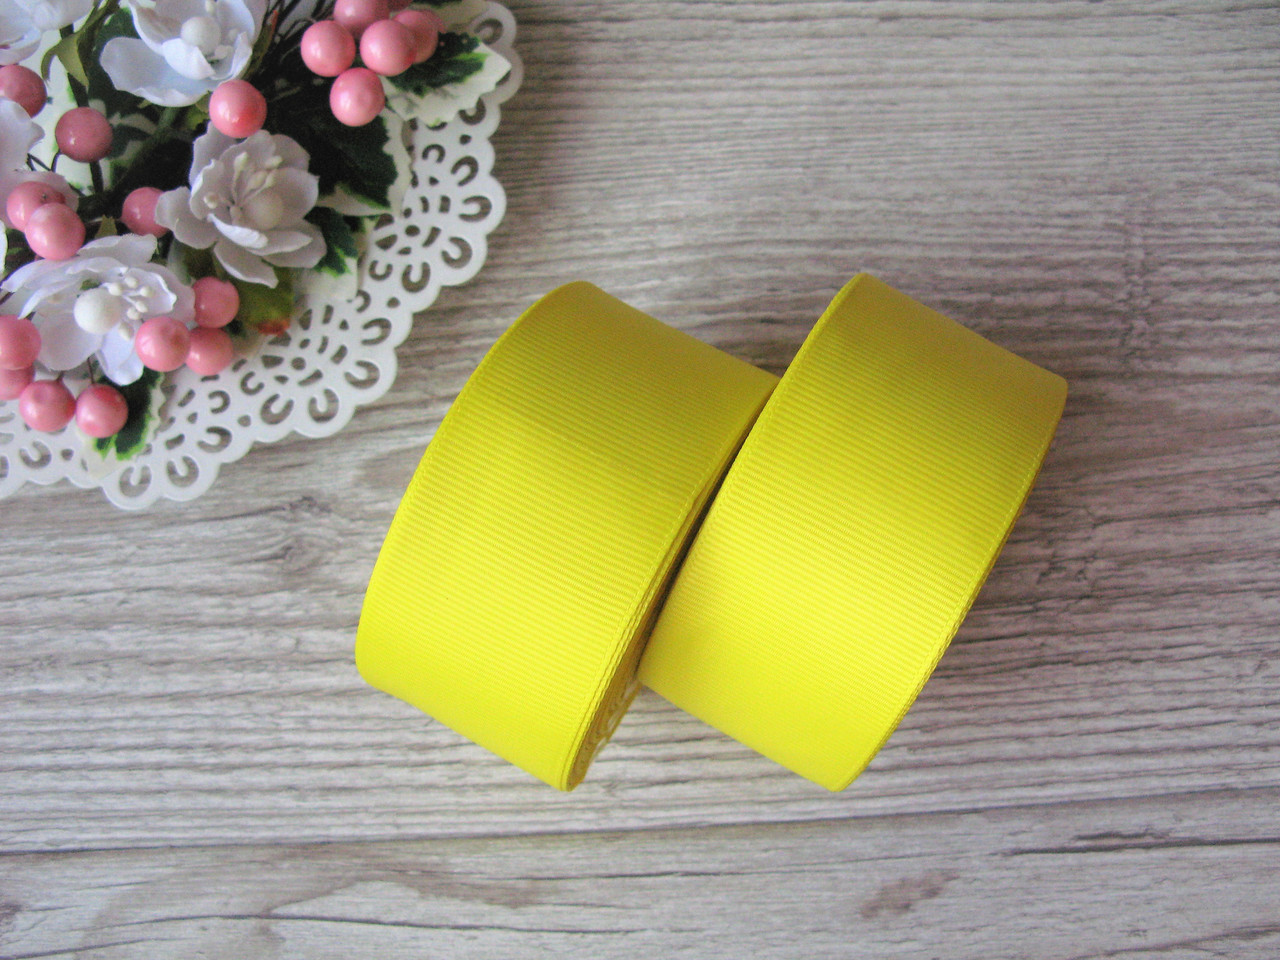 Лента репсовая, на метраж, ширина 4 см, цвет желтый, 4 грн за метр.